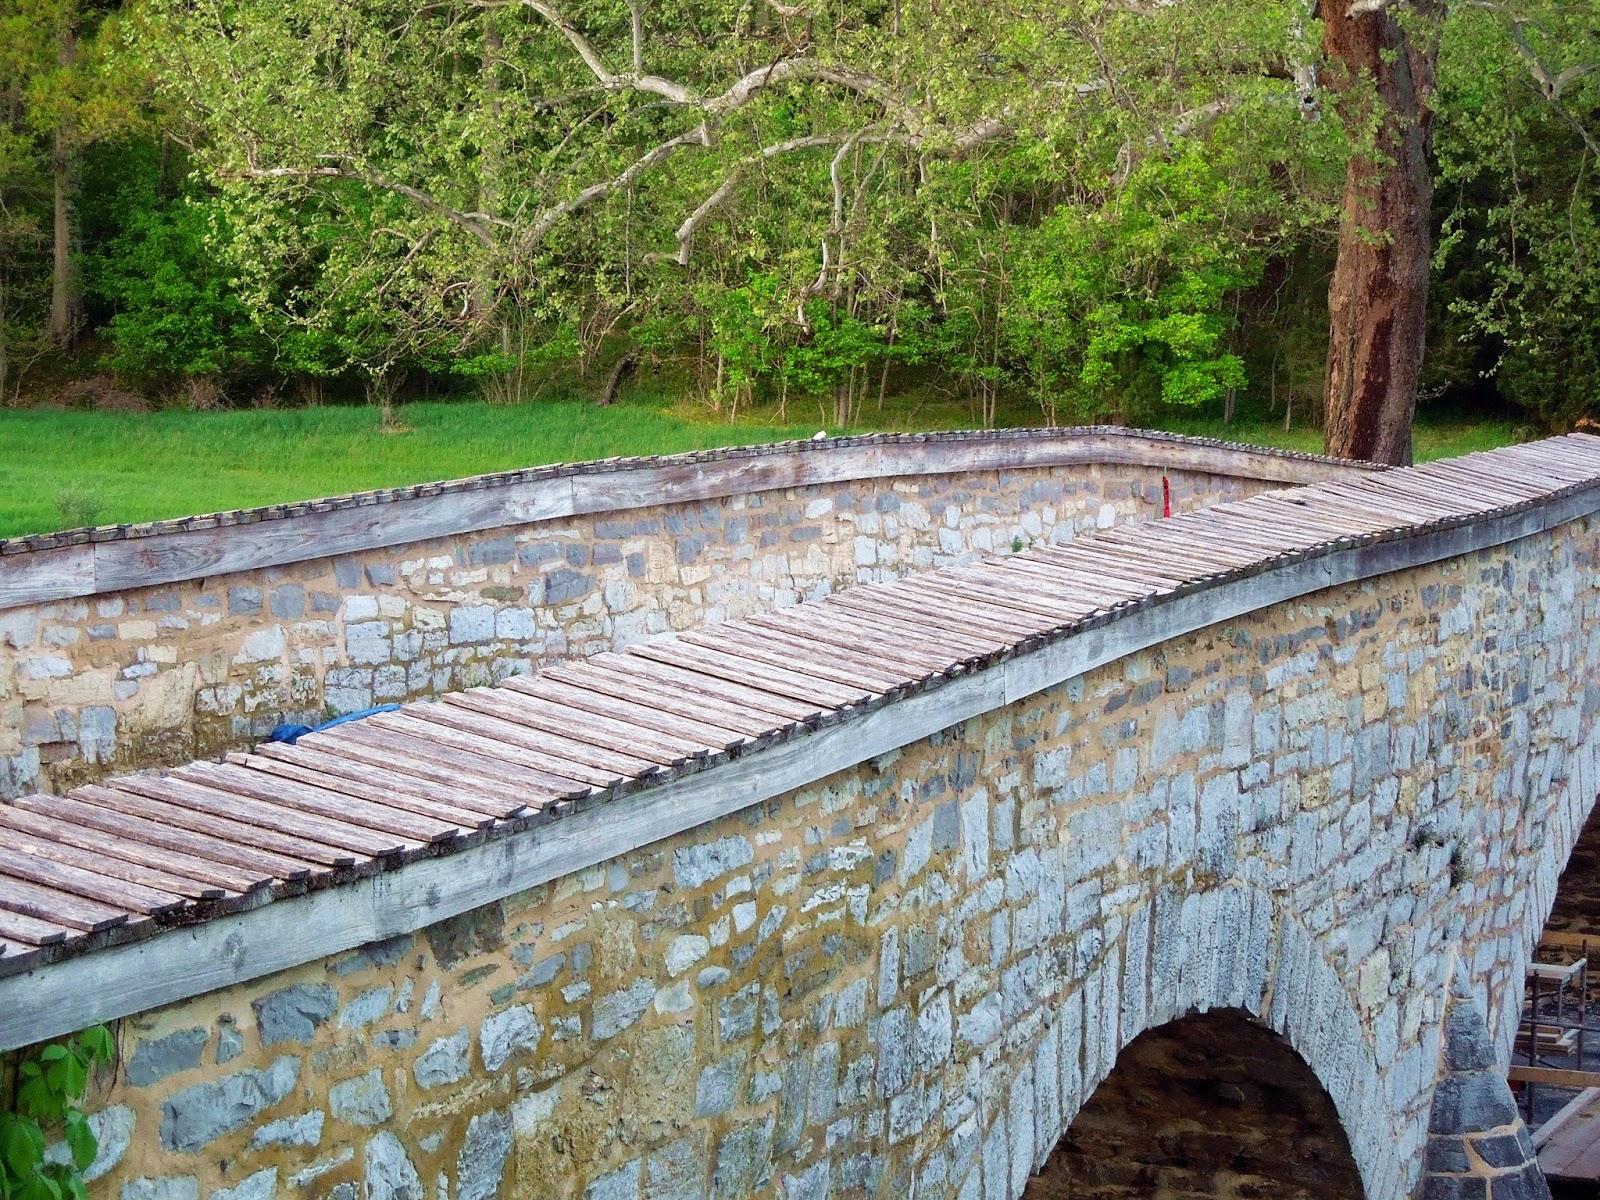 2016 017 MD Antietam NB Under construction Burnside Bridge DS 2016.JPG